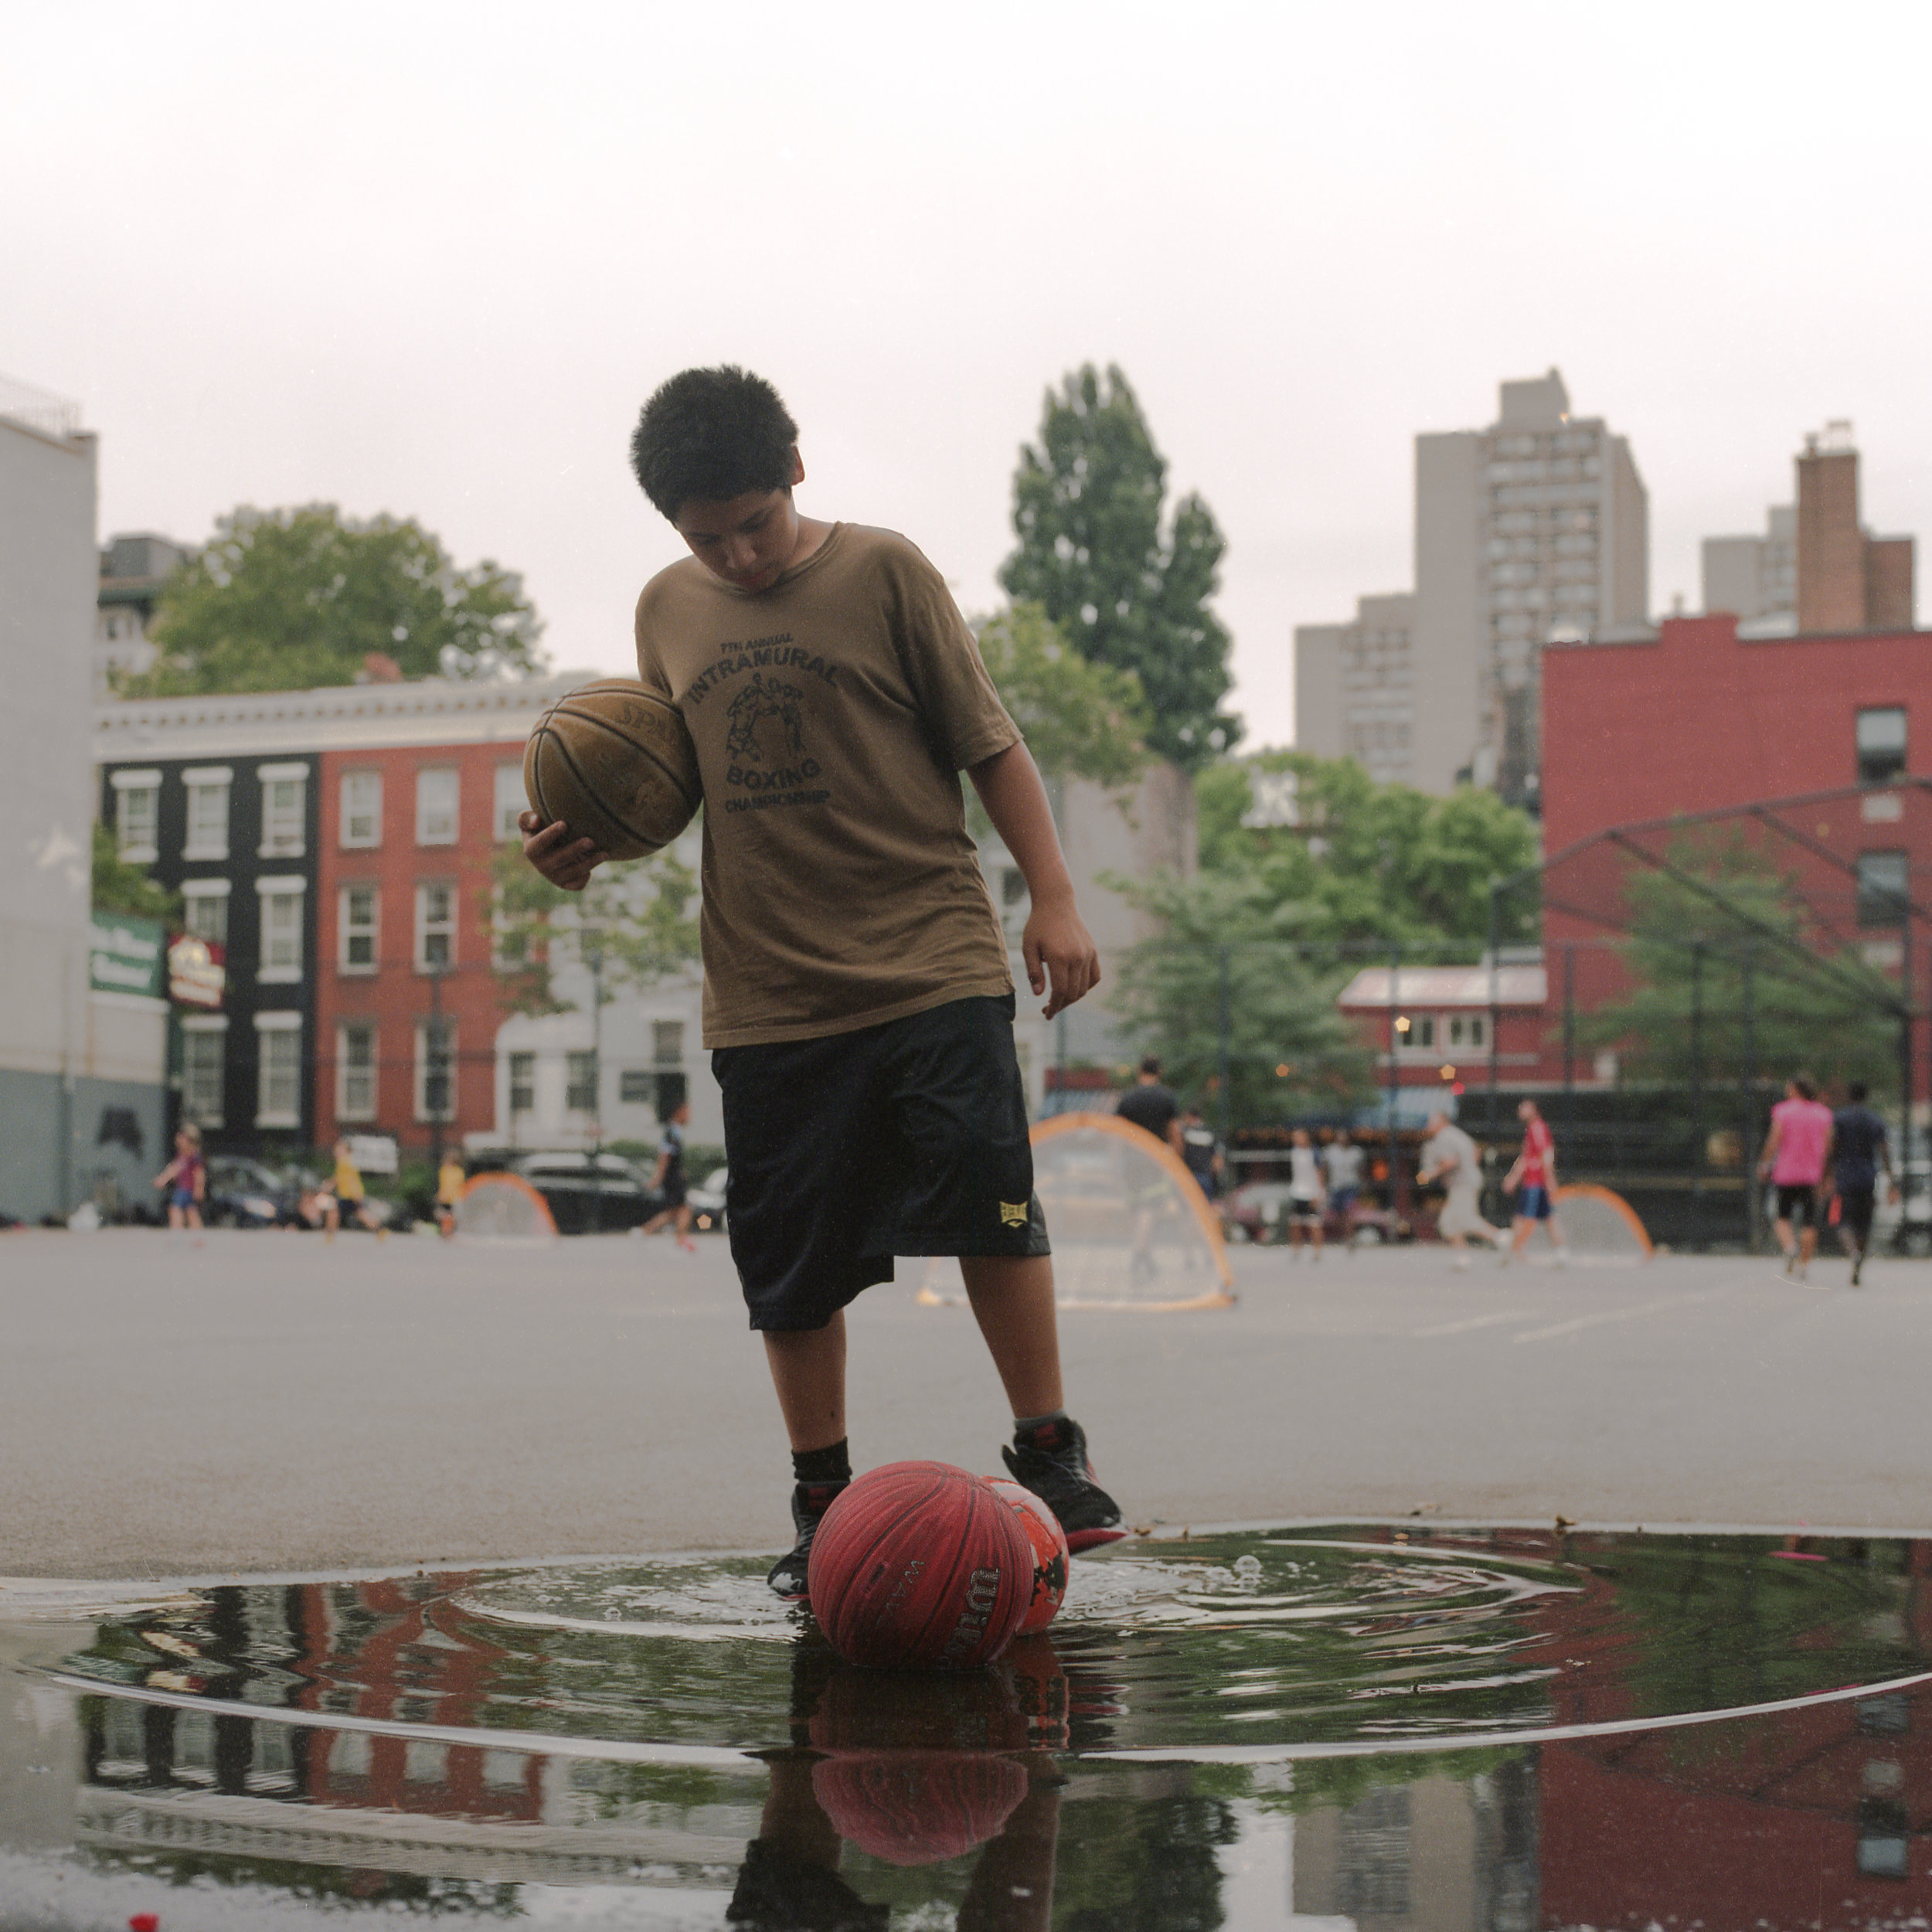 A boy with basket balls